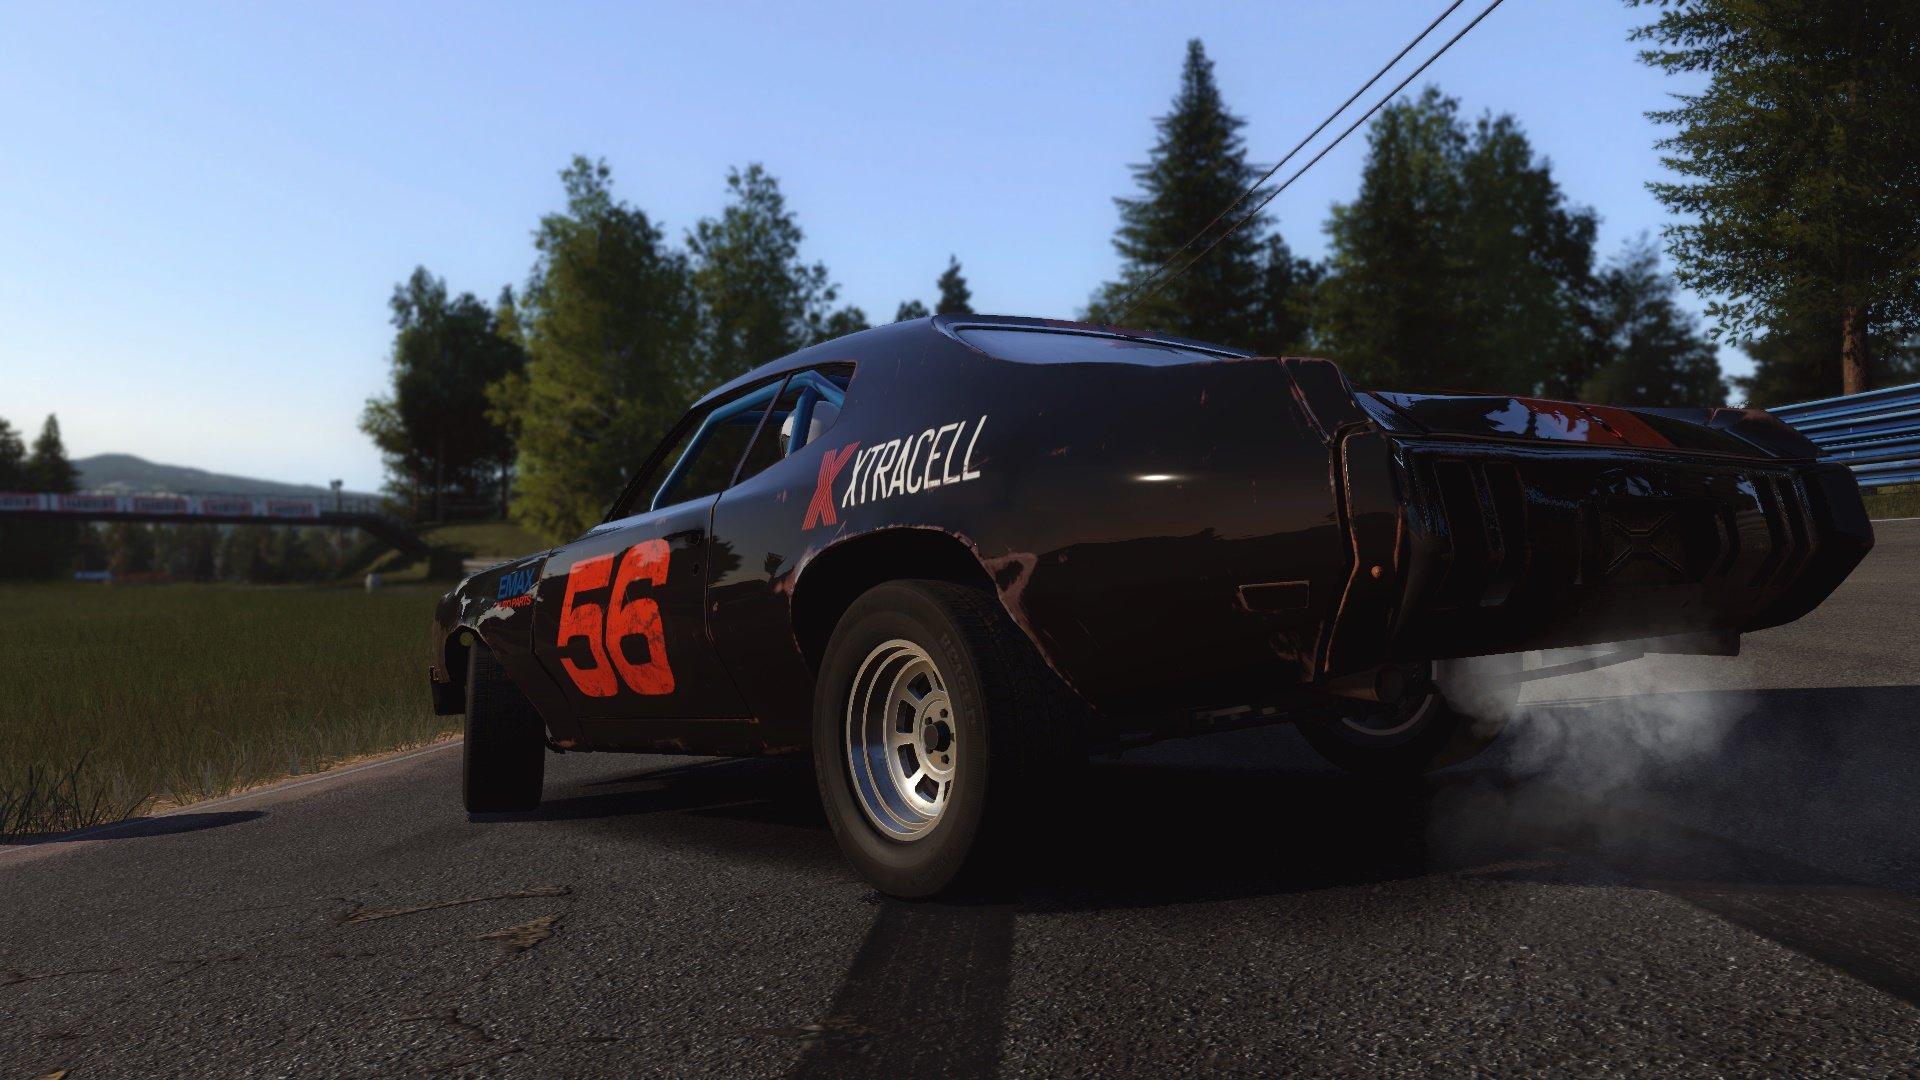 Next Car Game Wreckfest - June 2017 Update 5.jpg